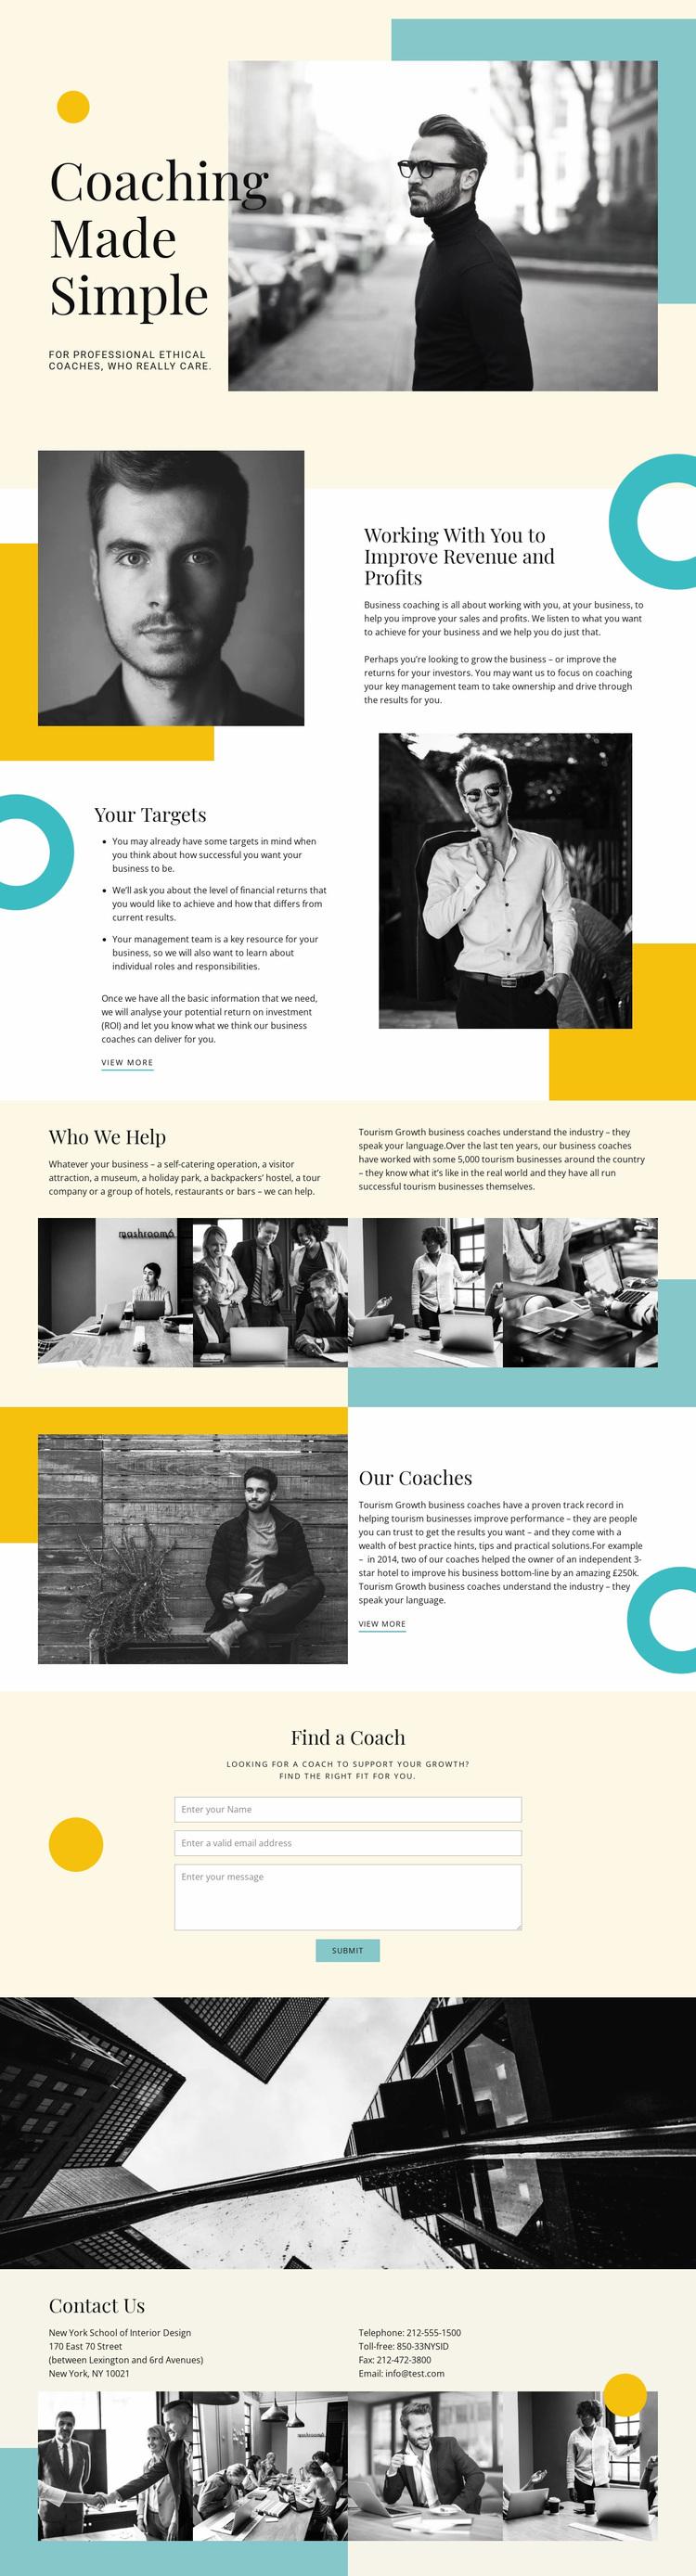 Coaching Company Website Design